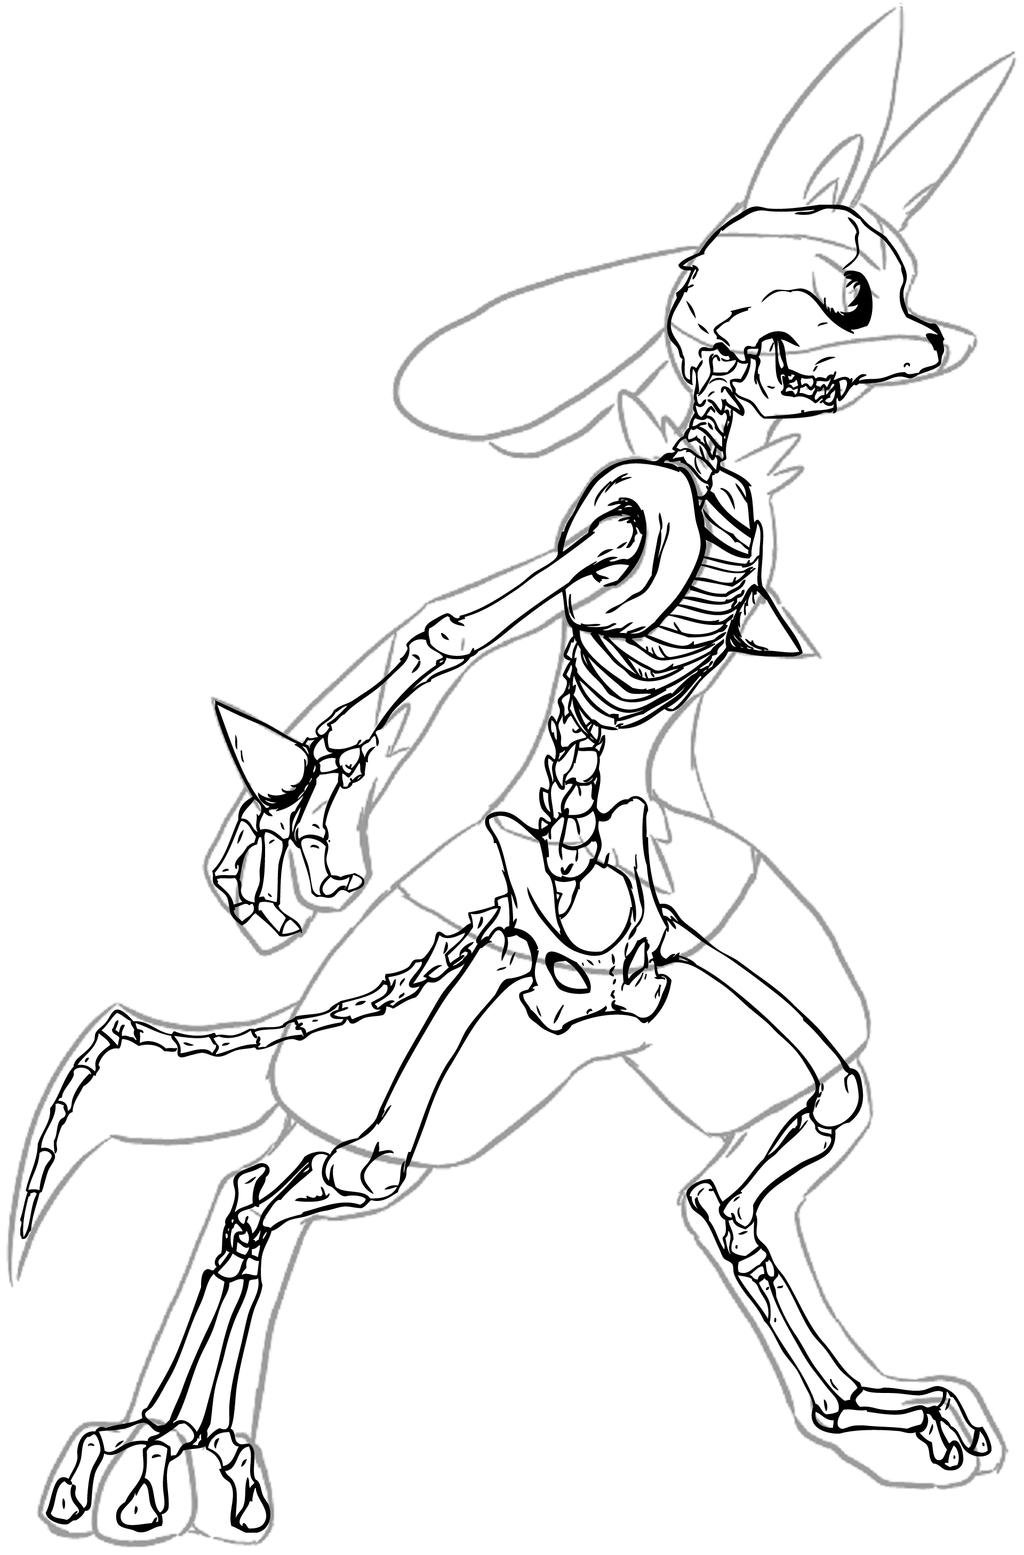 Lucario Skeleton By Chibi-Pika On DeviantArt